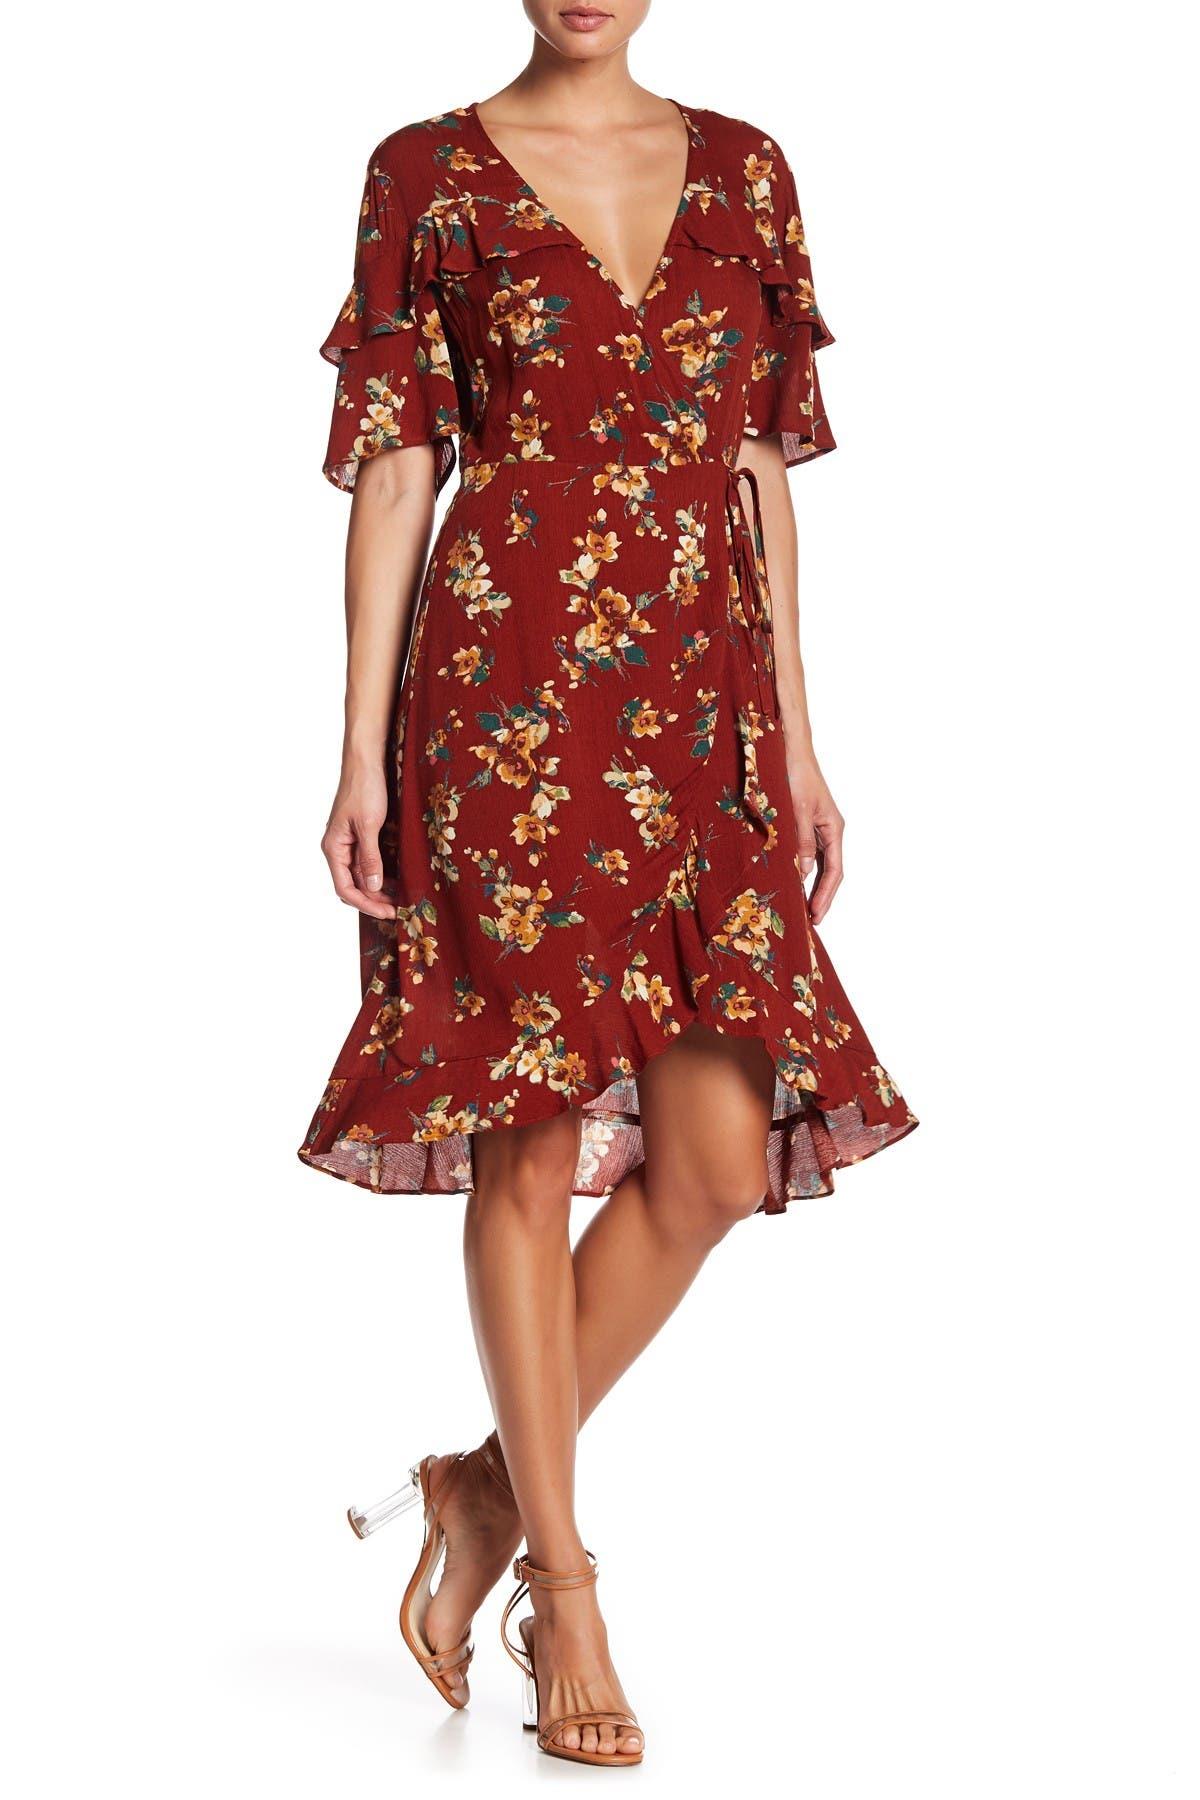 Image of Blu Pepper Ruffle Floral Wrap Dress